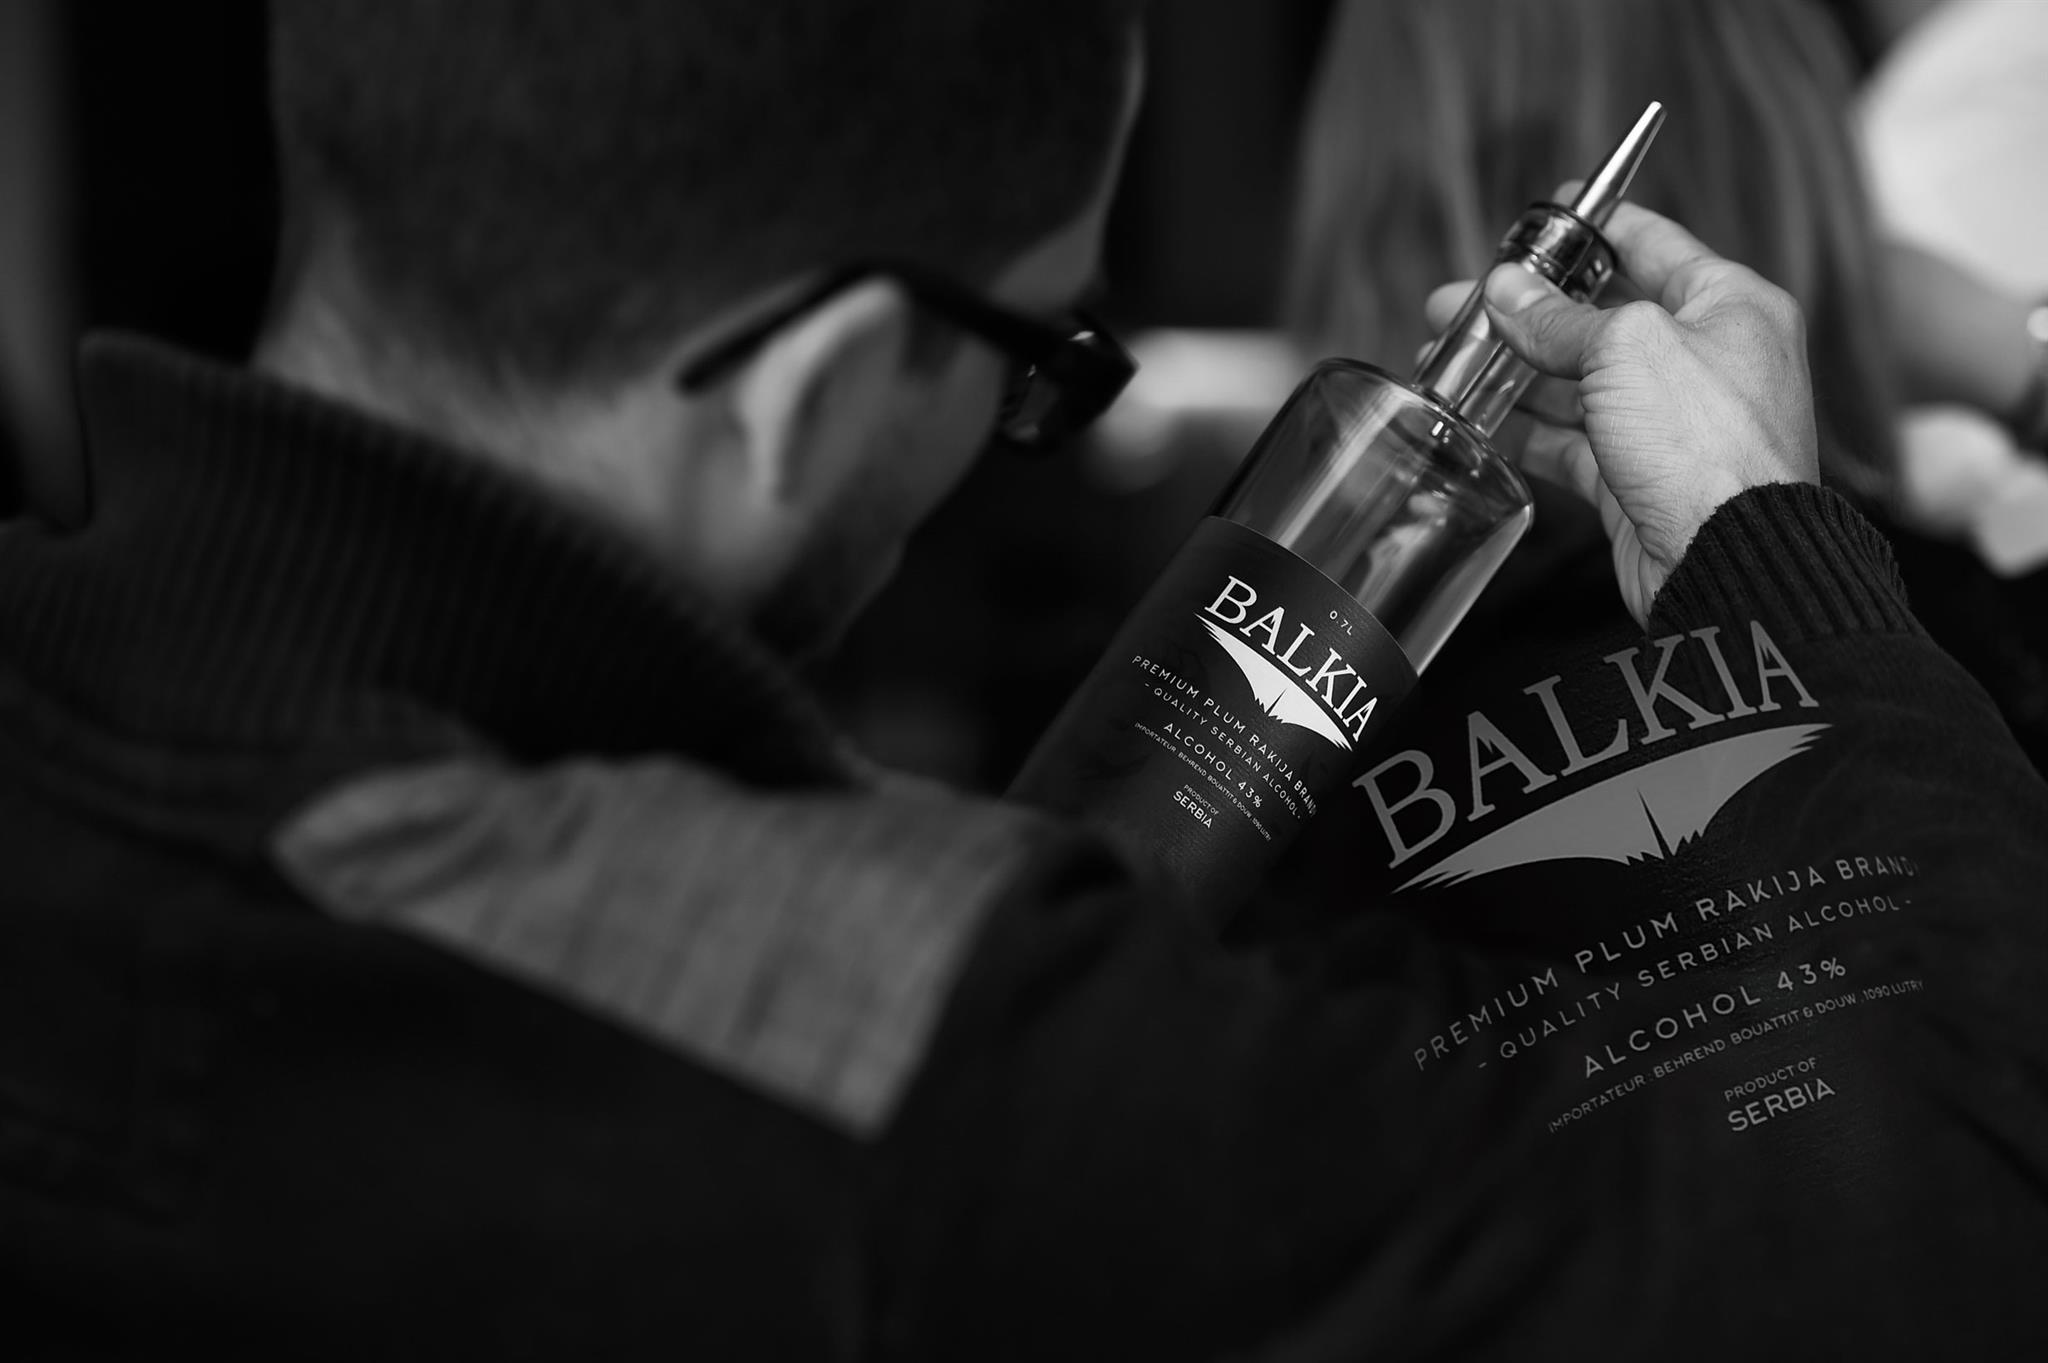 Premium Plum Rakija - Balkia